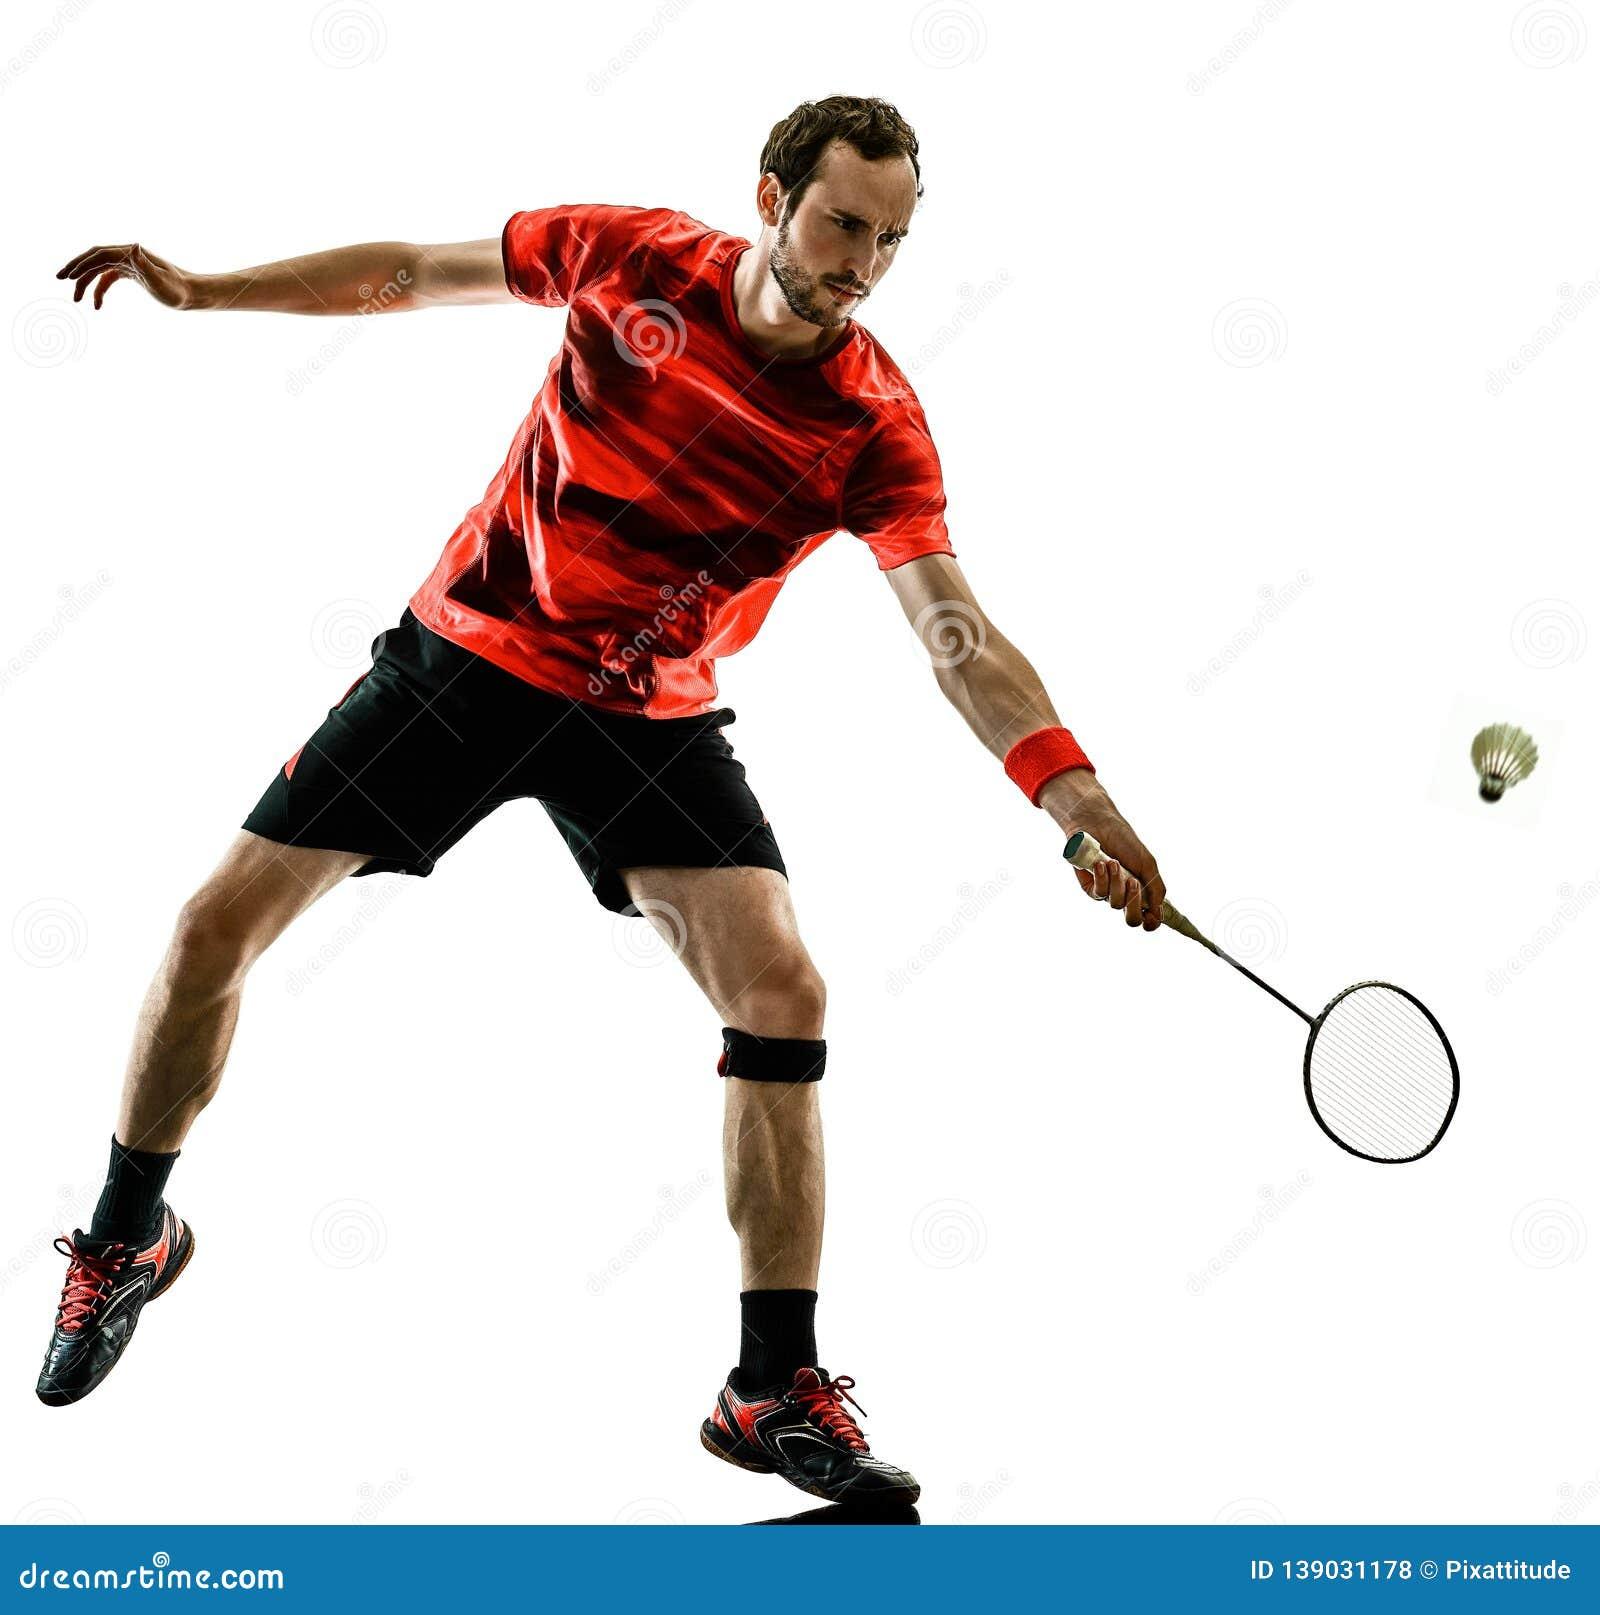 Badminton Player Man Shadow Silhouette Isolated White Backgroun